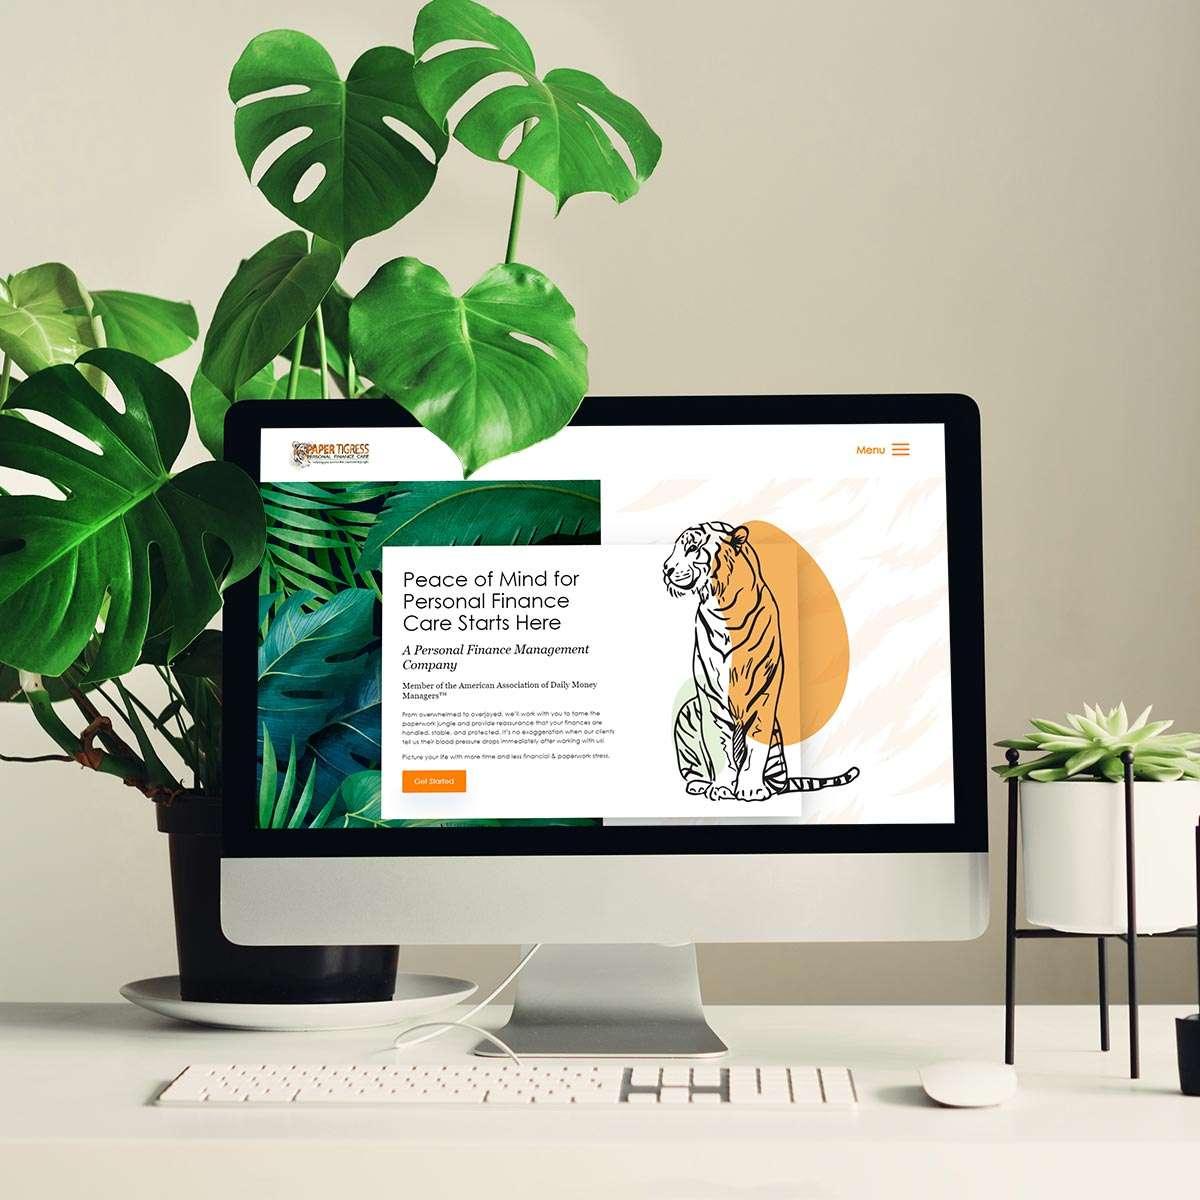 Finance management website design by BrandSwan, a Delaware branding agency